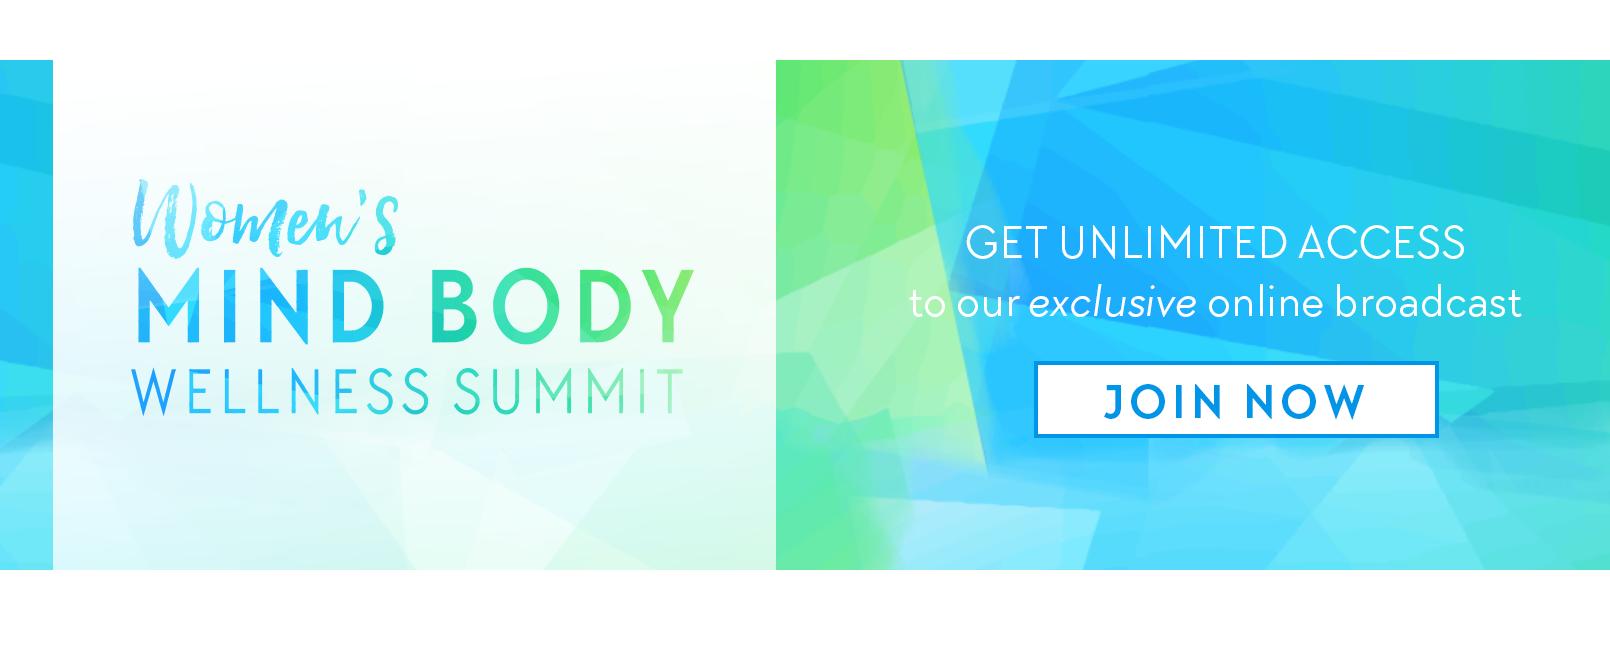 MyHealthSpin.com Women's Mind Body Wellness Summit